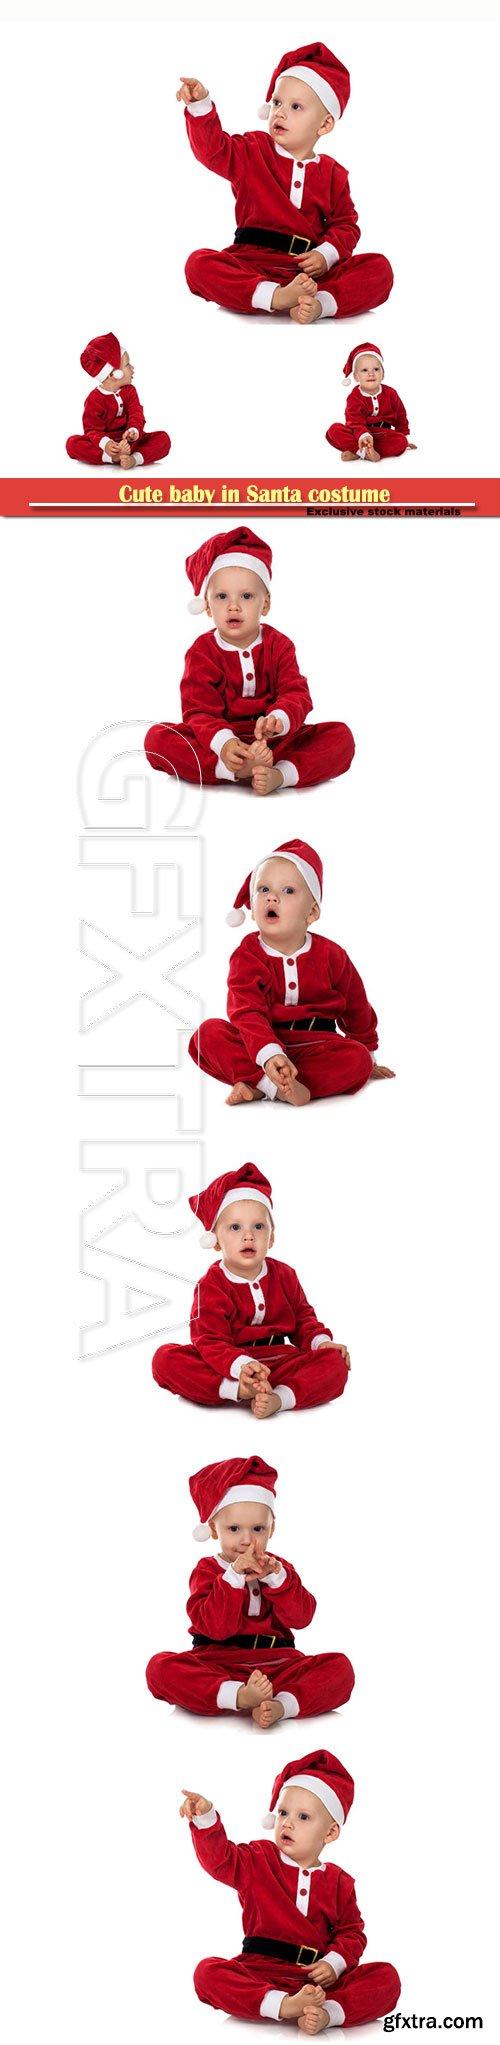 Cute baby in Santa costume